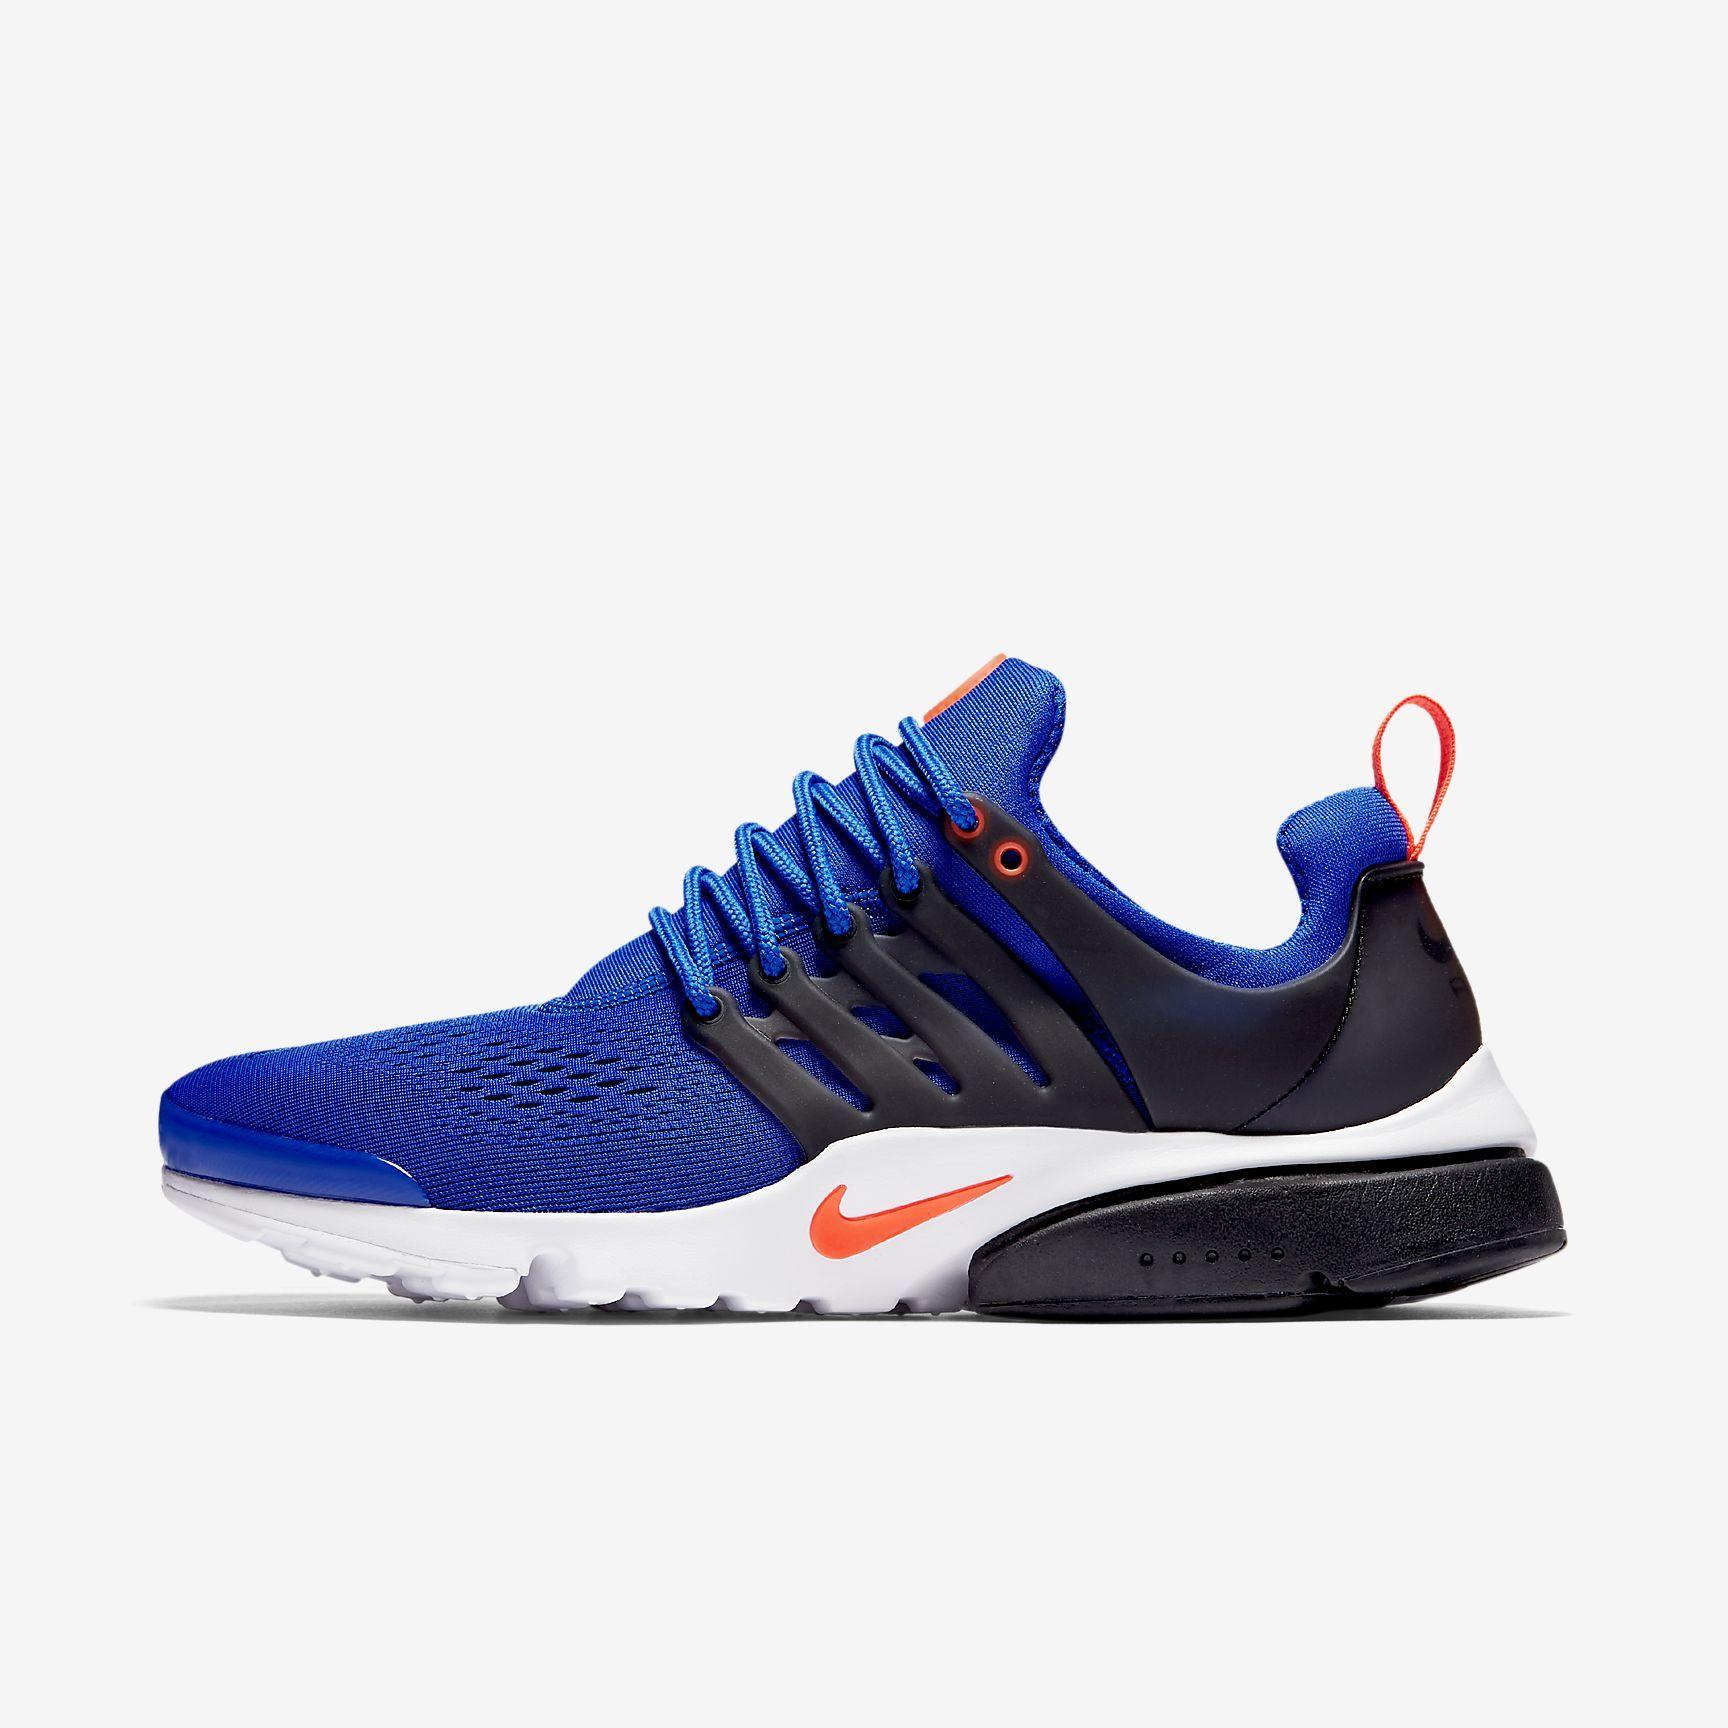 Nike Air Presto Ultra Breathe Men's Shoe Nike air presto